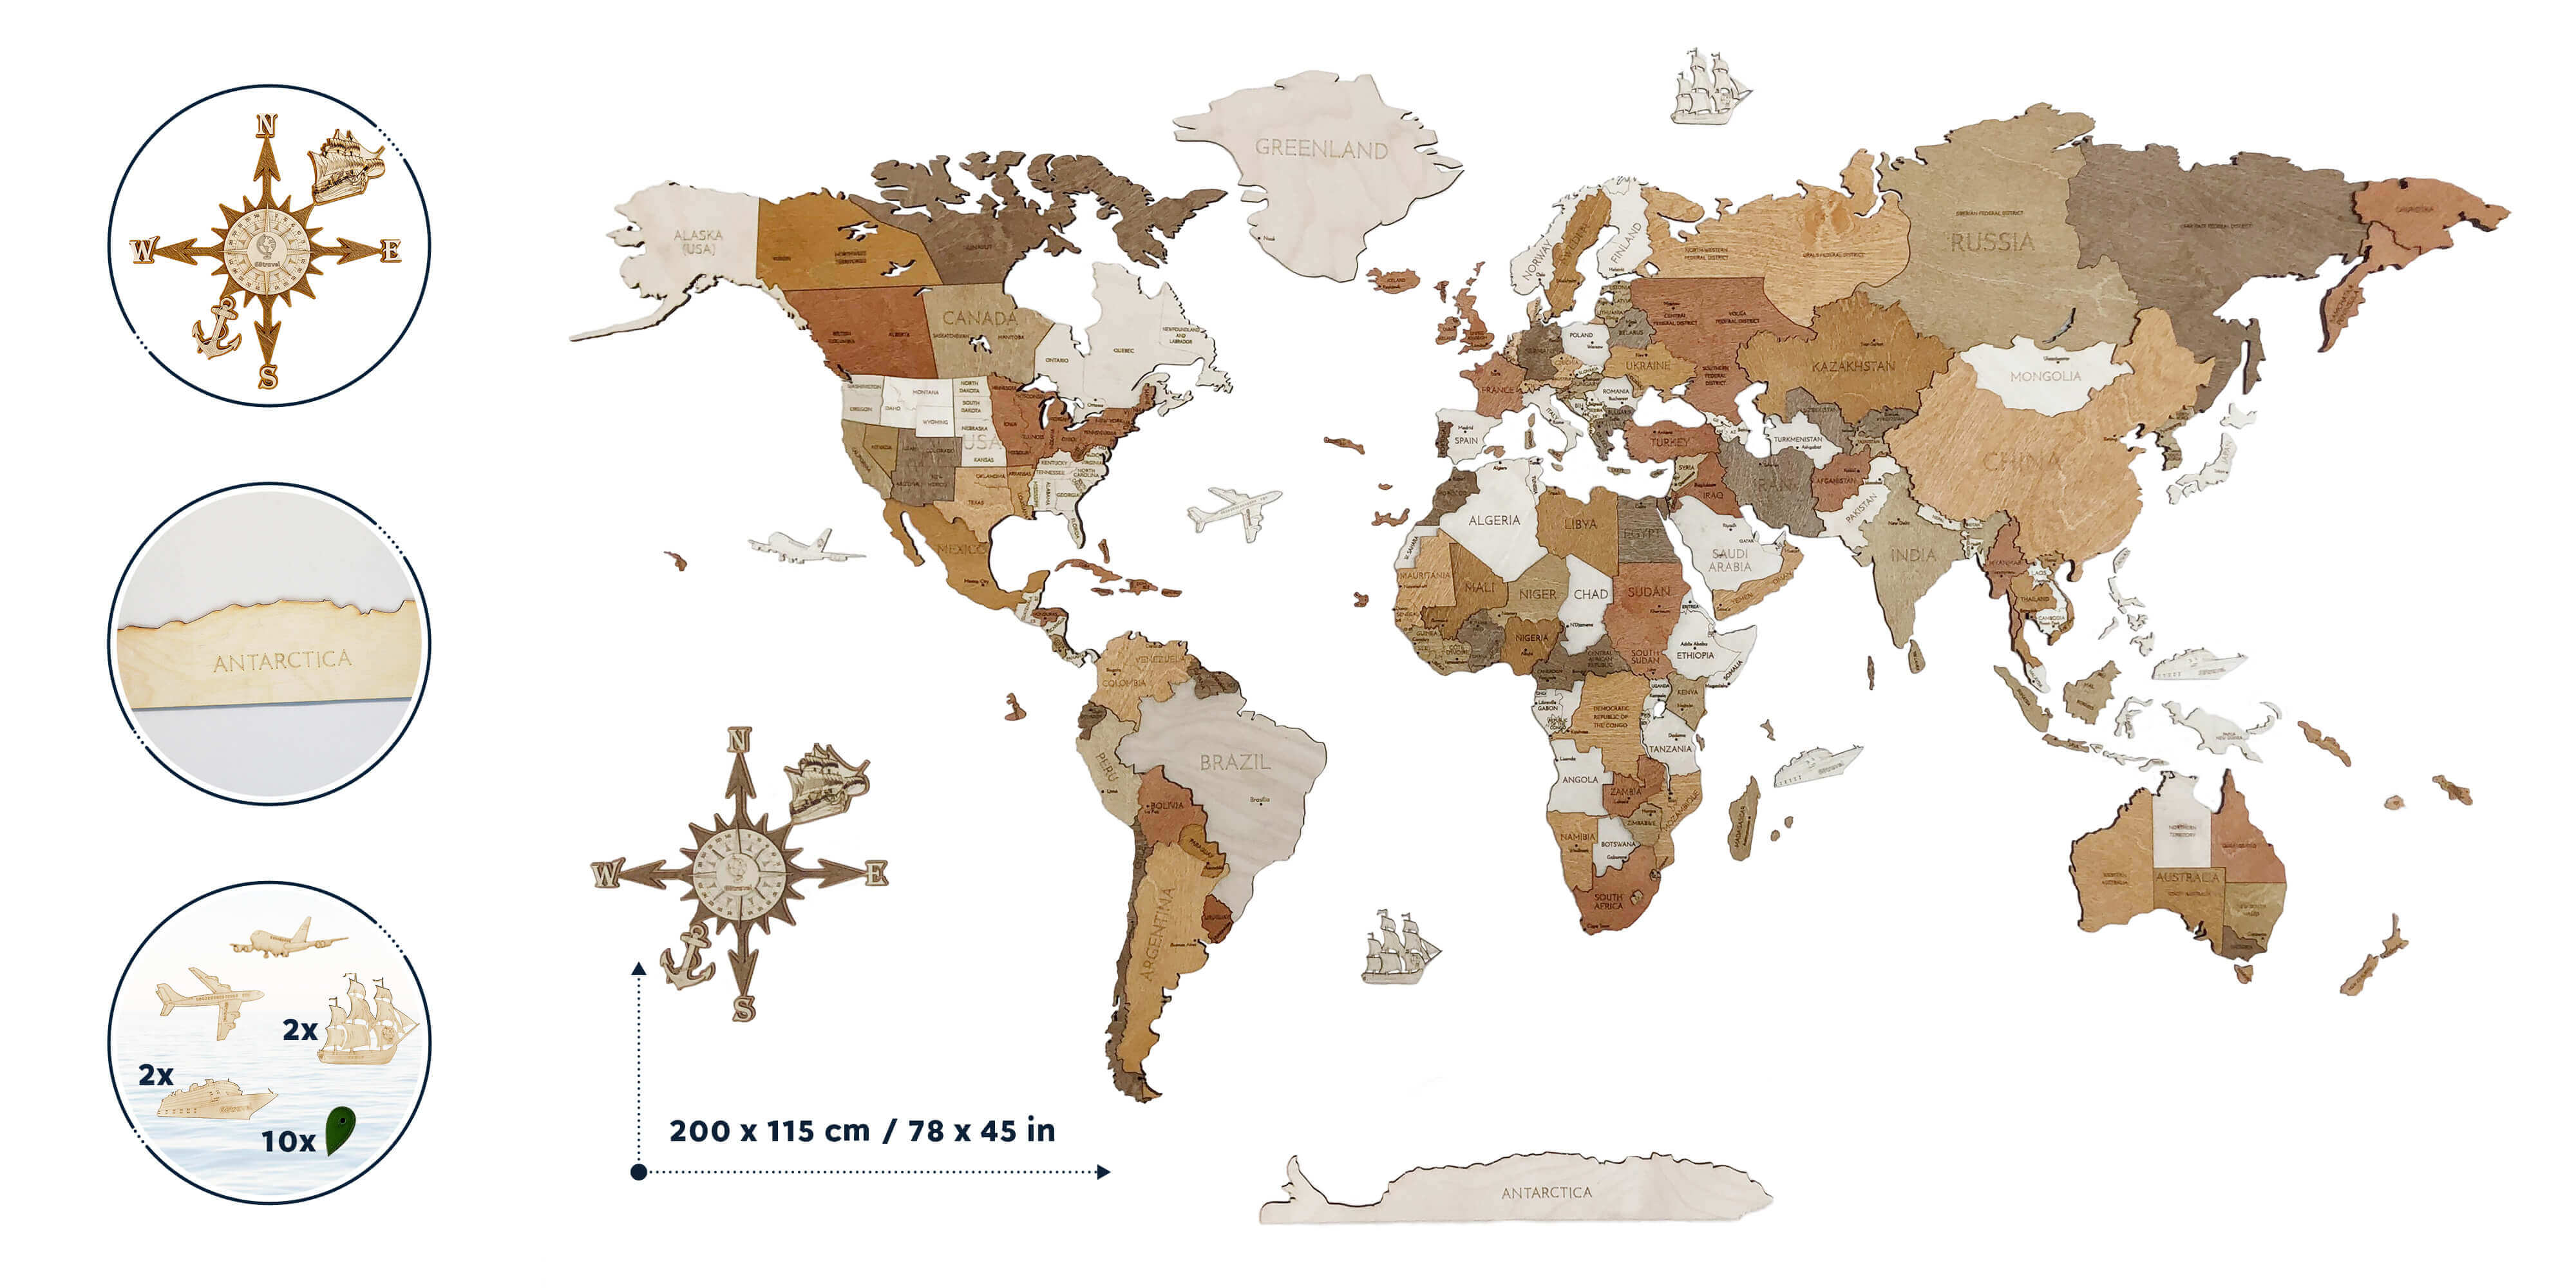 Drevená mapa sveta XL Antarctica (rozmer 200 x 115 cm)